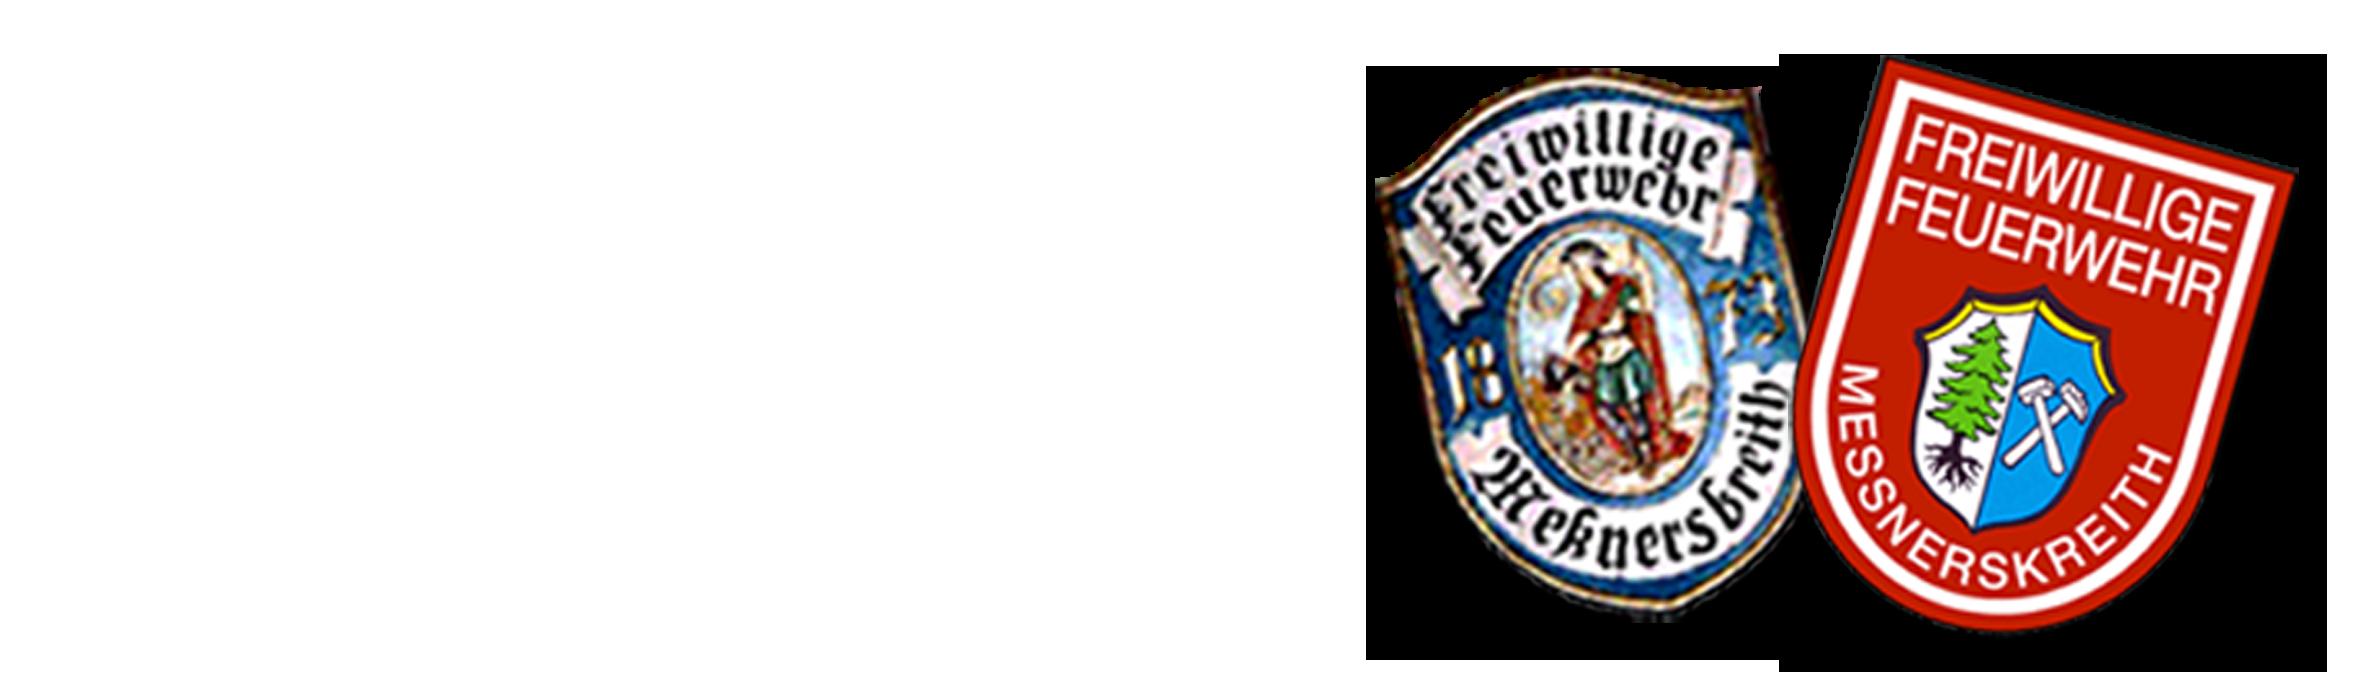 Freiwillige Feuerwehr Meßnerskreith e.V.